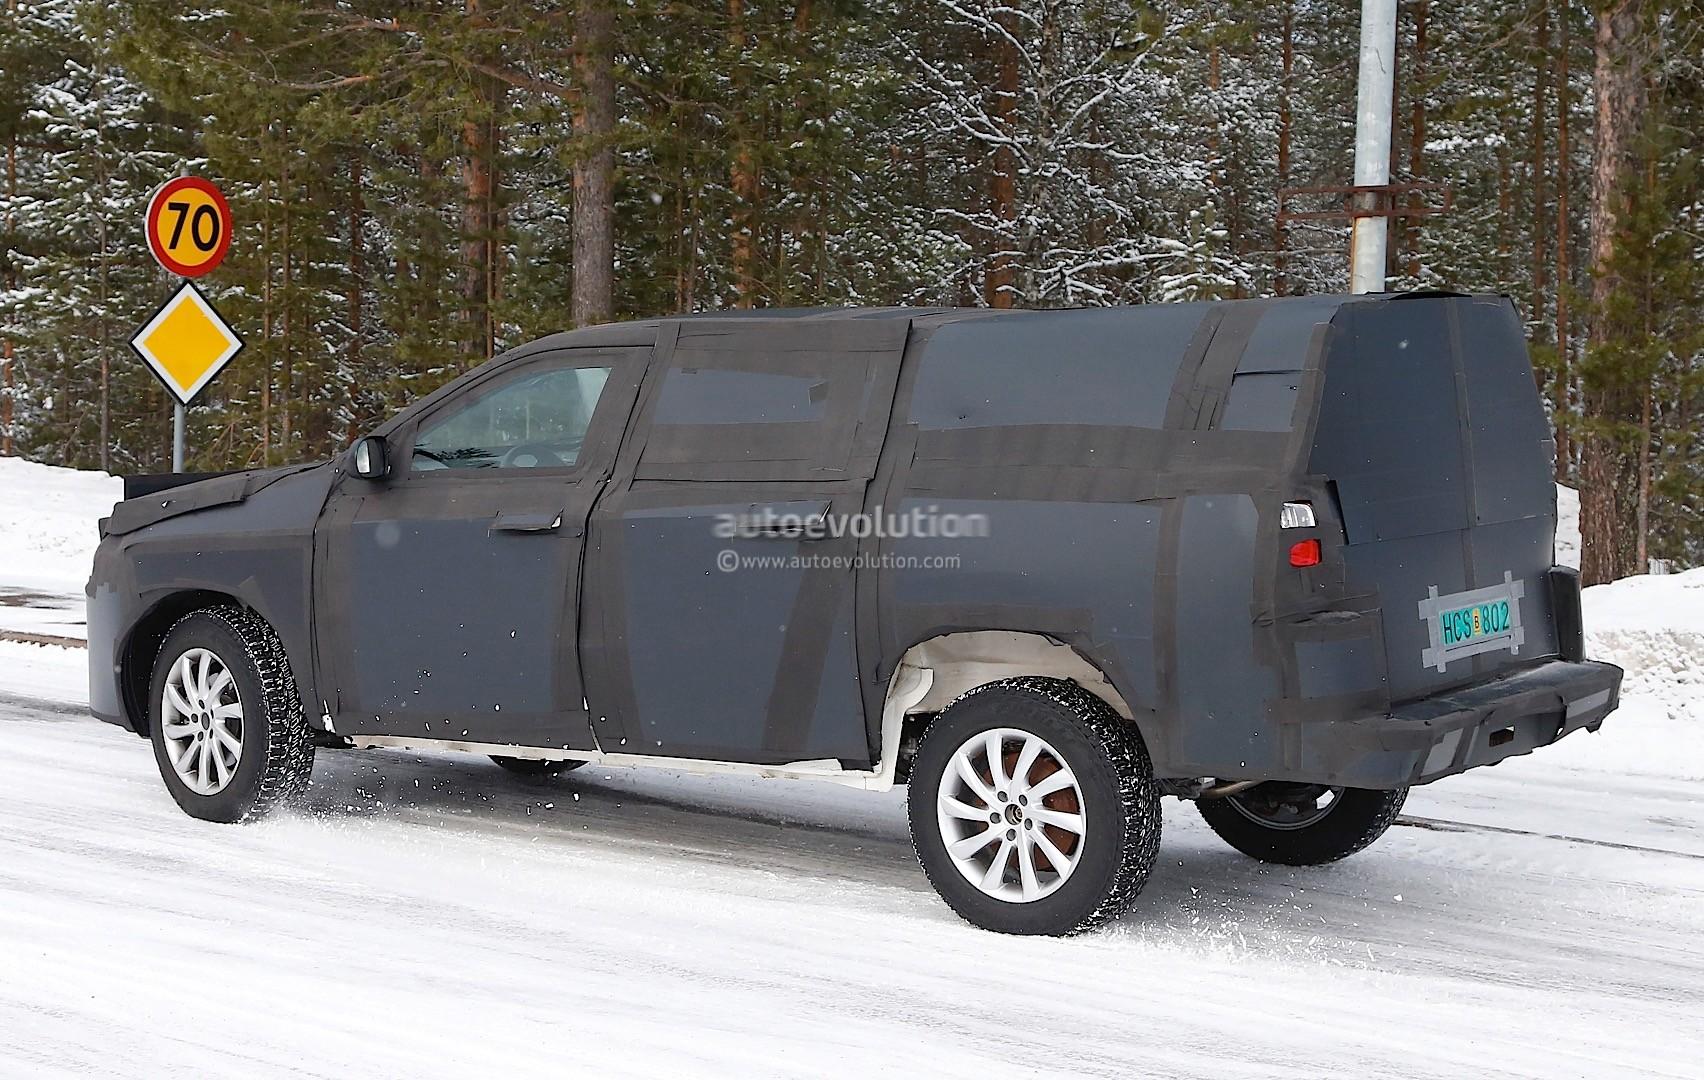 All New Dodge Dakota Mid Size Ram Pickup Truck Spied Testing Photo Gallery on 89 Dodge Dakota